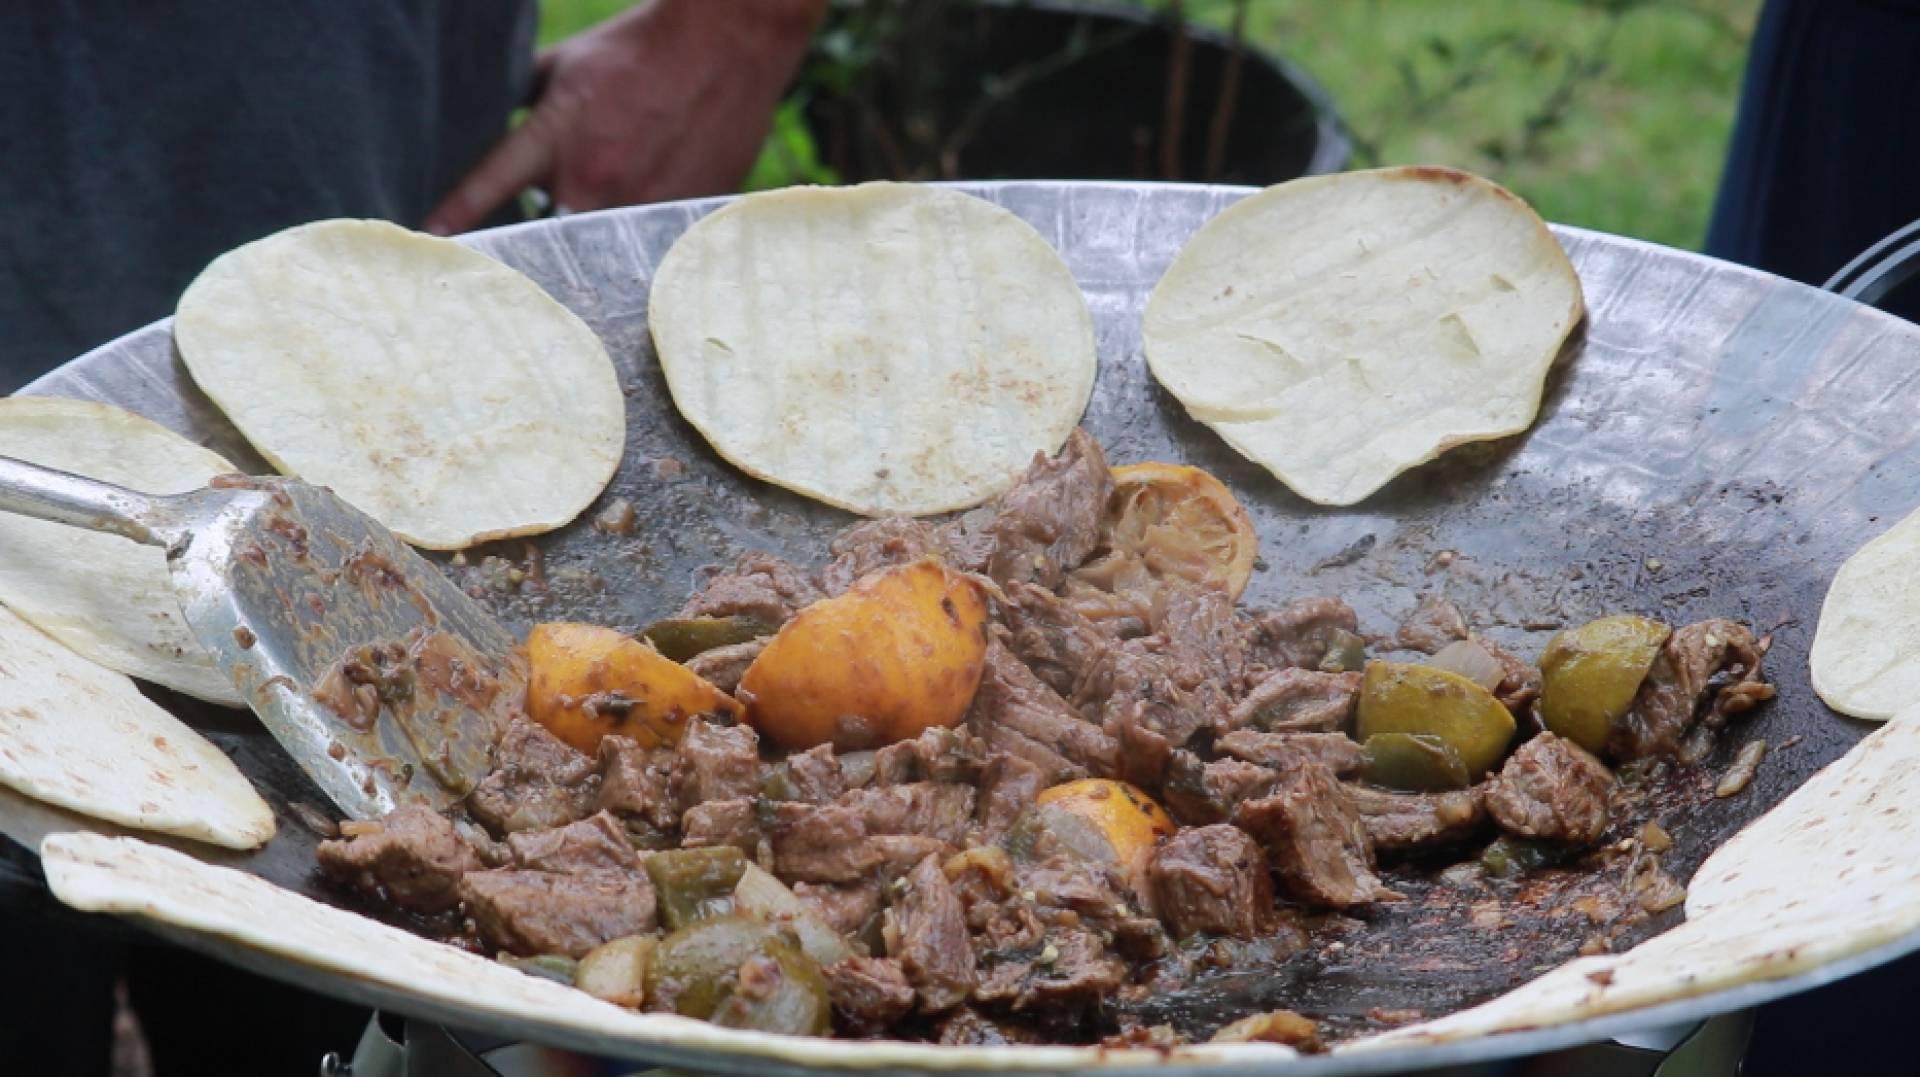 Vegetarian Mexican Stir Fry (4 Portion)